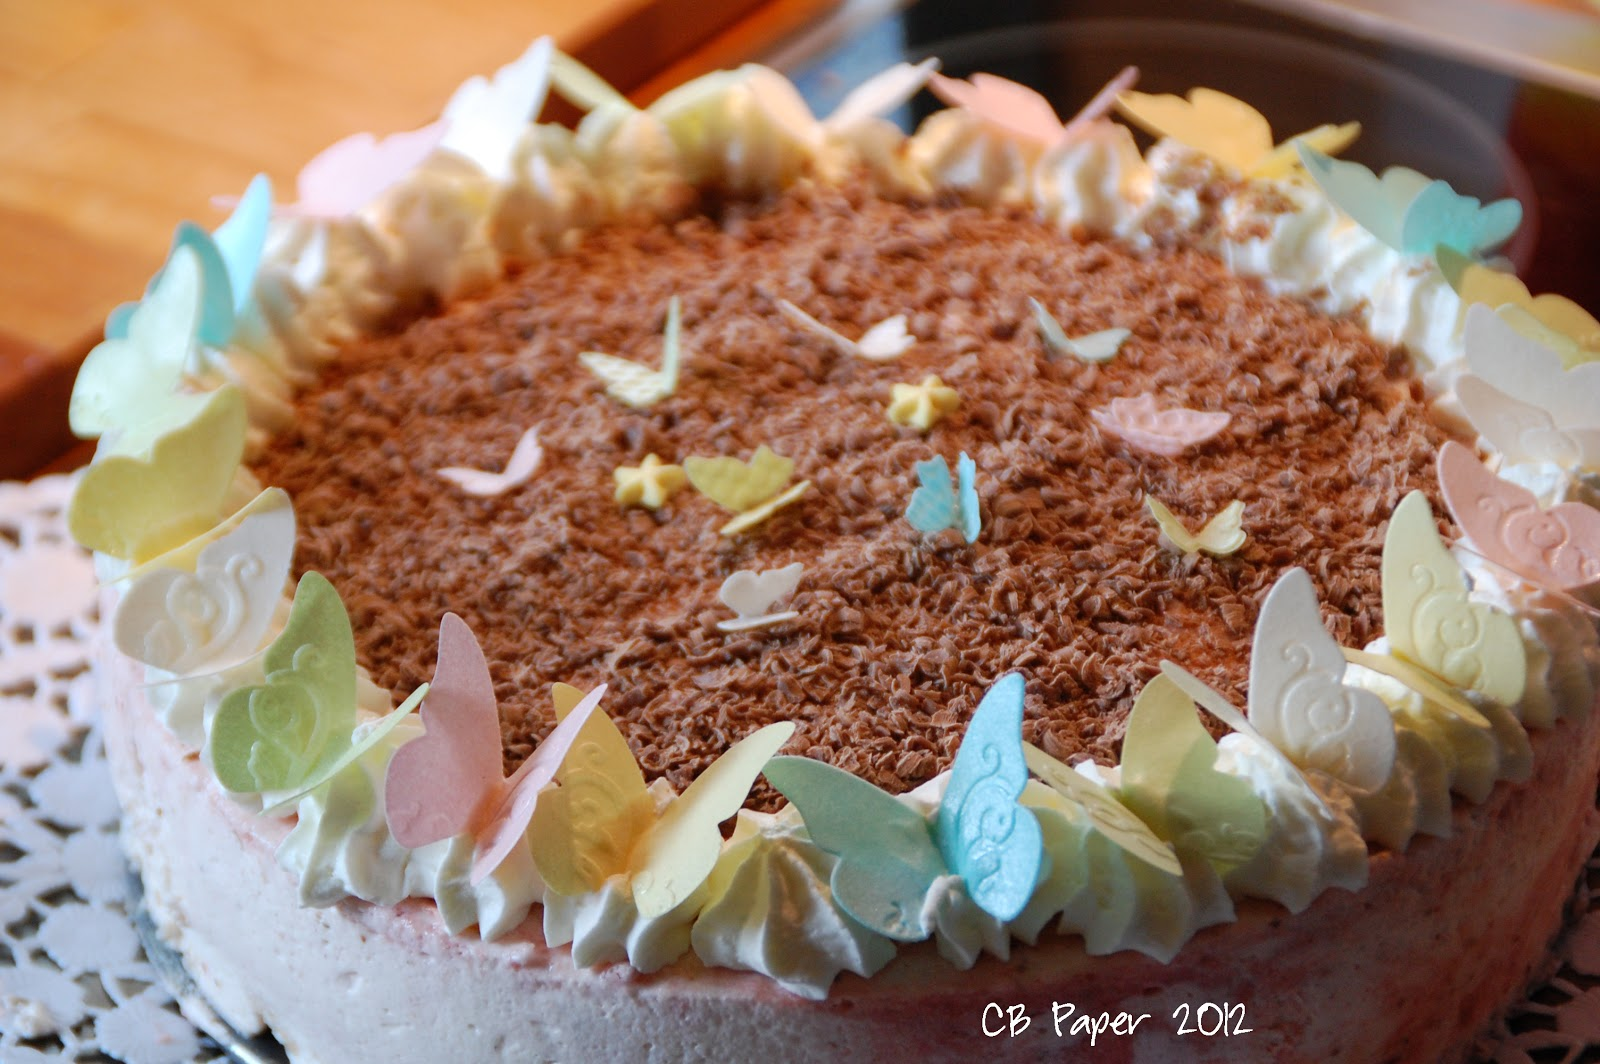 http://1.bp.blogspot.com/-LbXhC9mGzFA/T-2KkSuHoBI/AAAAAAAAAkE/o3O1kNUvxcI/s1600/Torte.jpg